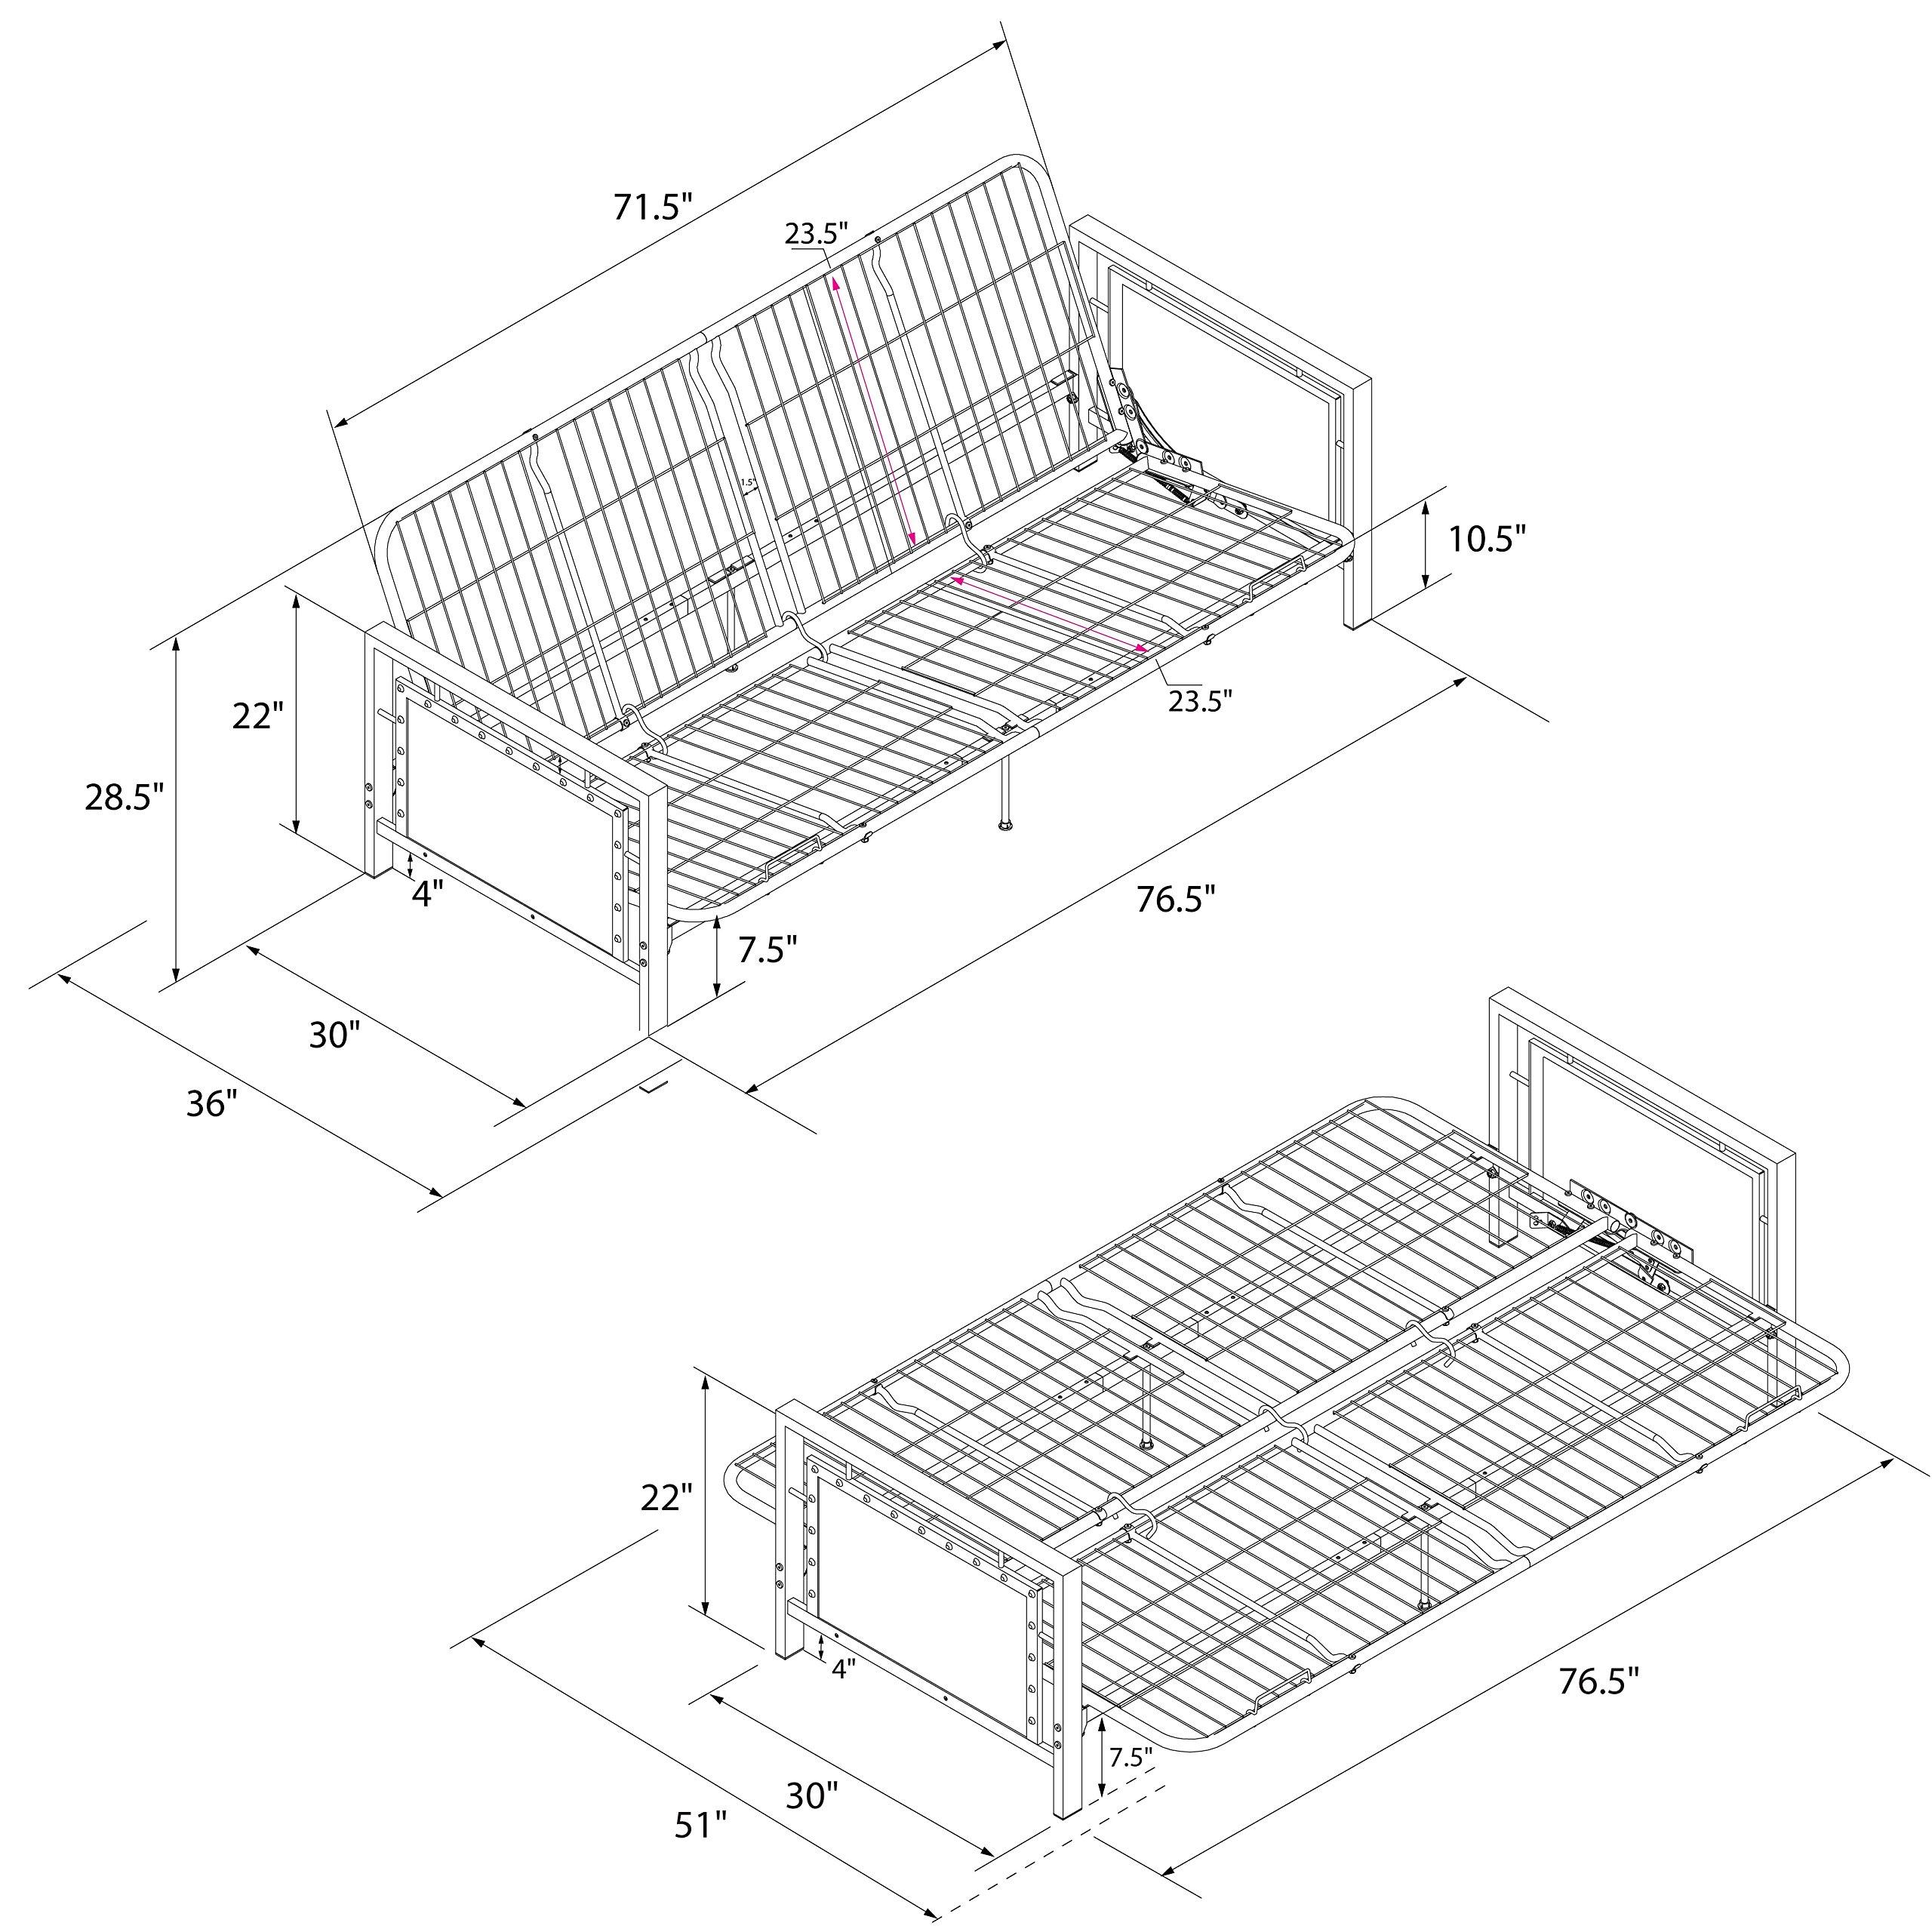 DHP Henley Metal Arm Futon Frame, Industrial Loft Design, Converts to Sleeper, Black Sturdy Metal by DHP (Image #7)